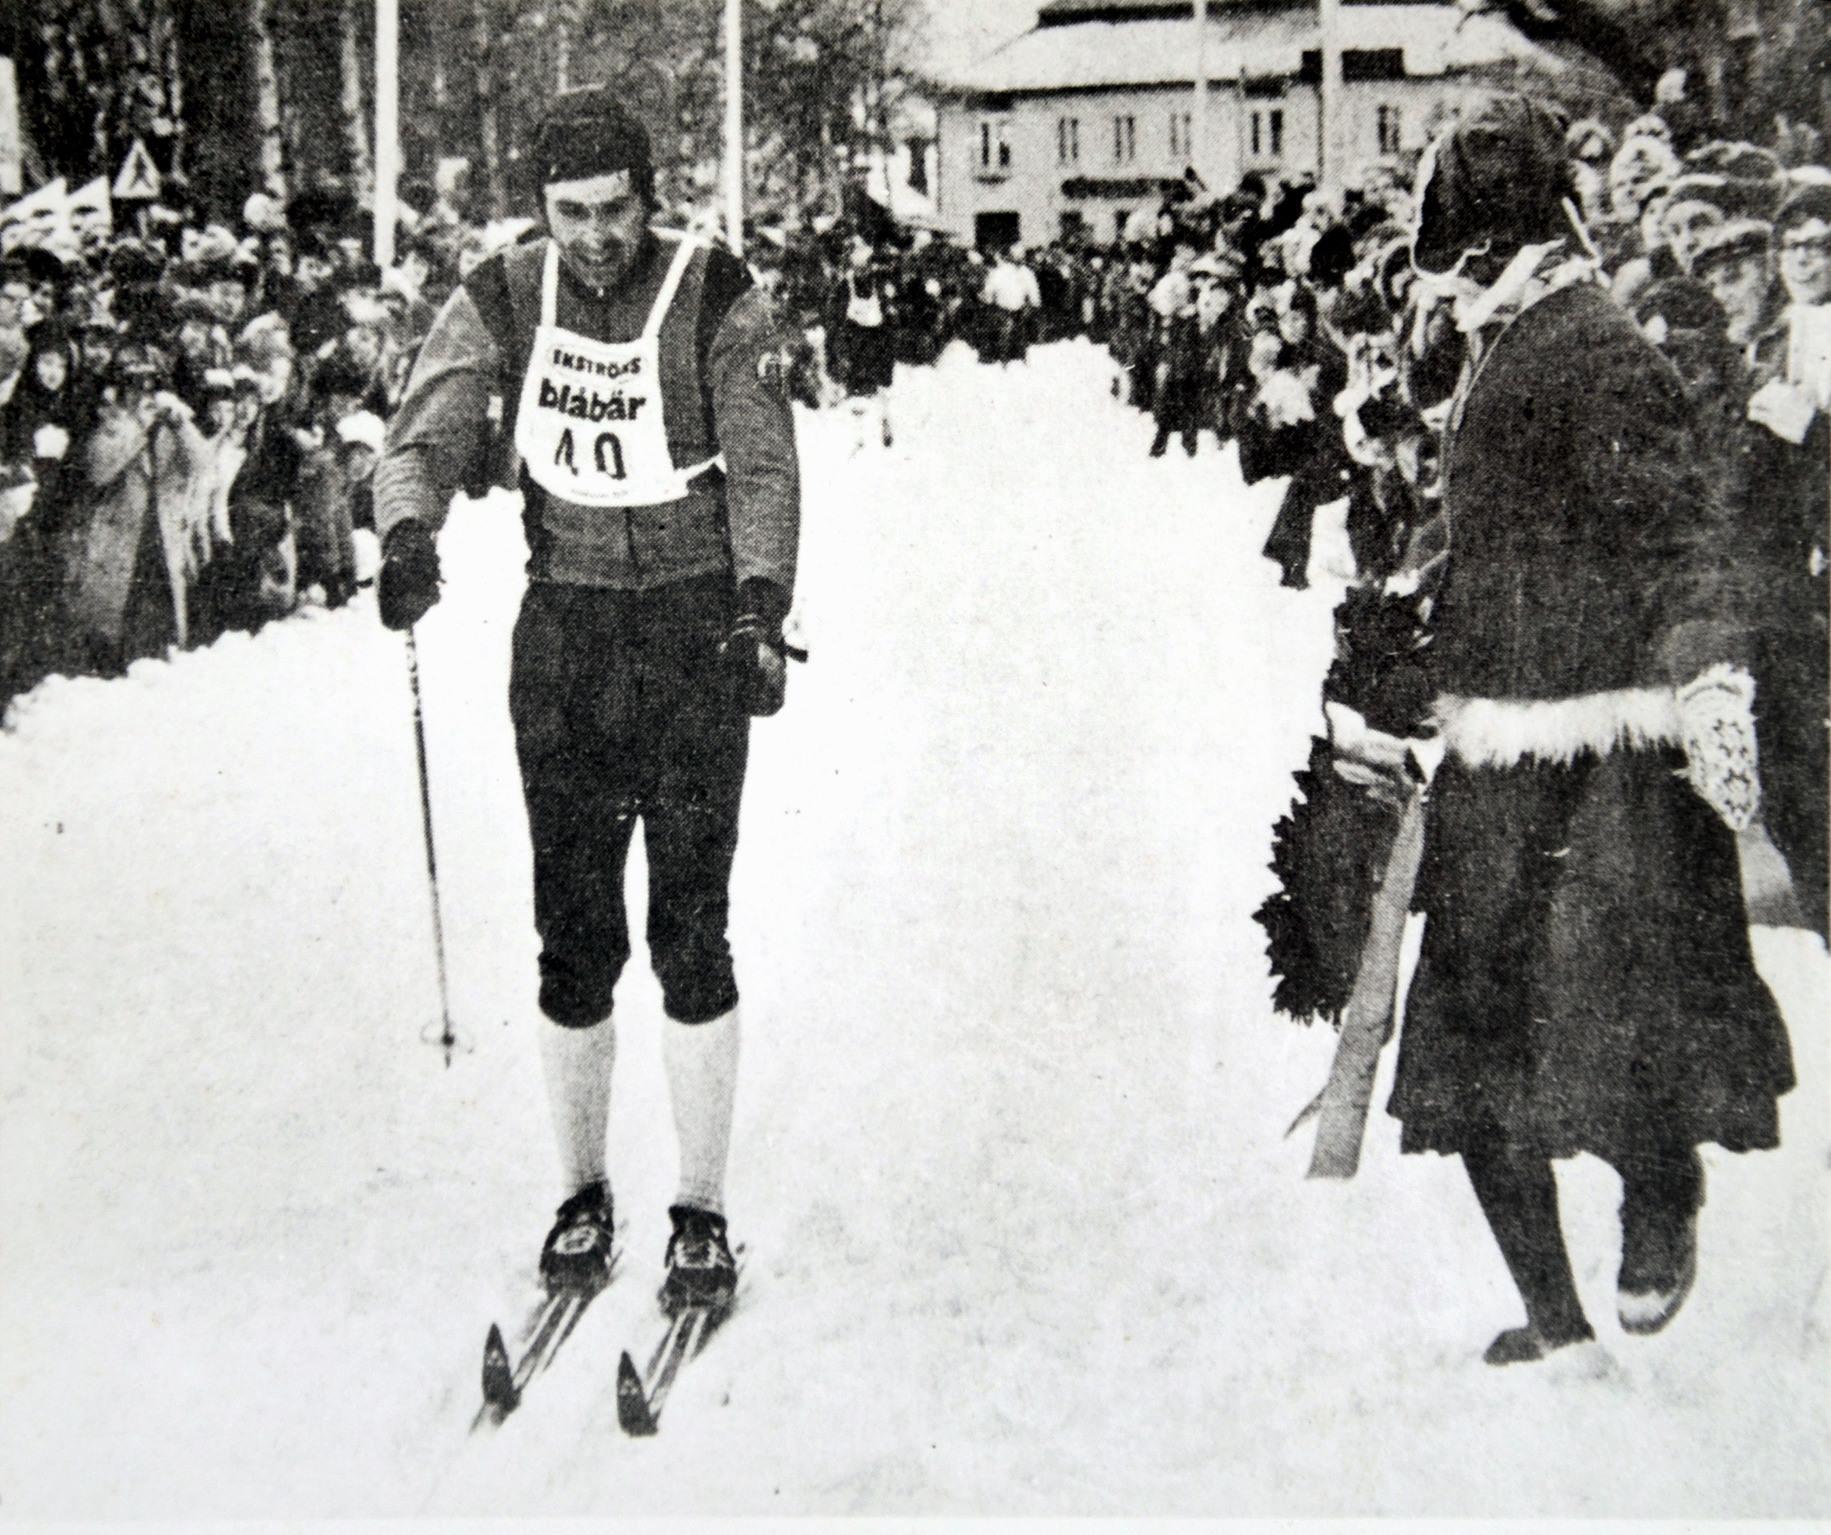 Gert-Dietmar Klause vasaloppet